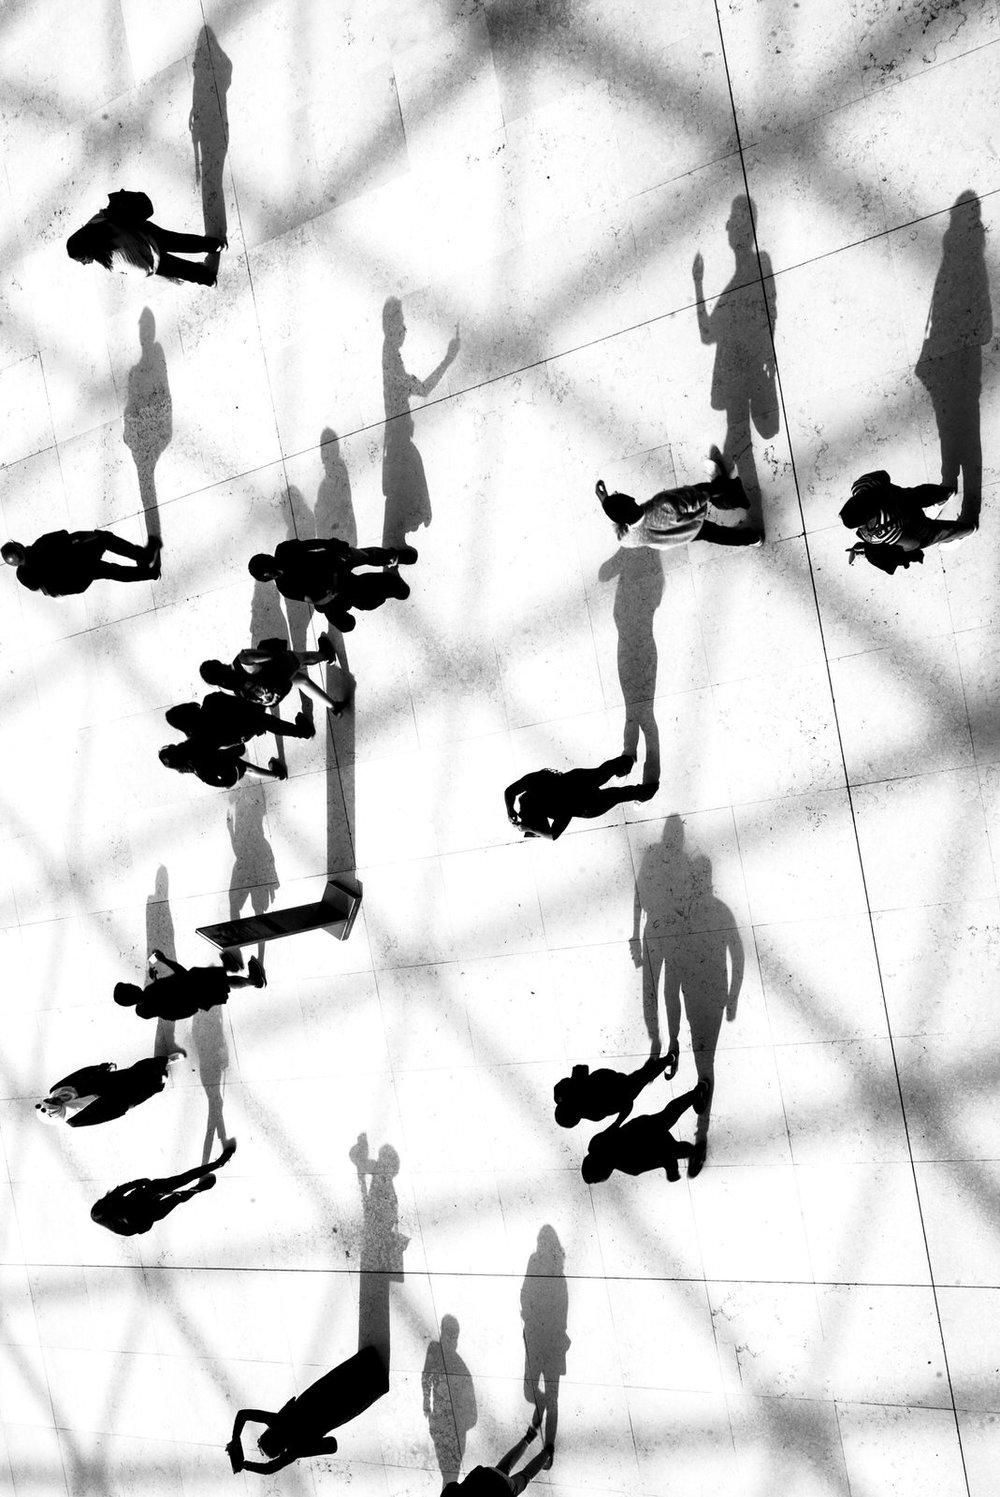 Alan Schaller - London Street Photographer - Metropolis32.jpg